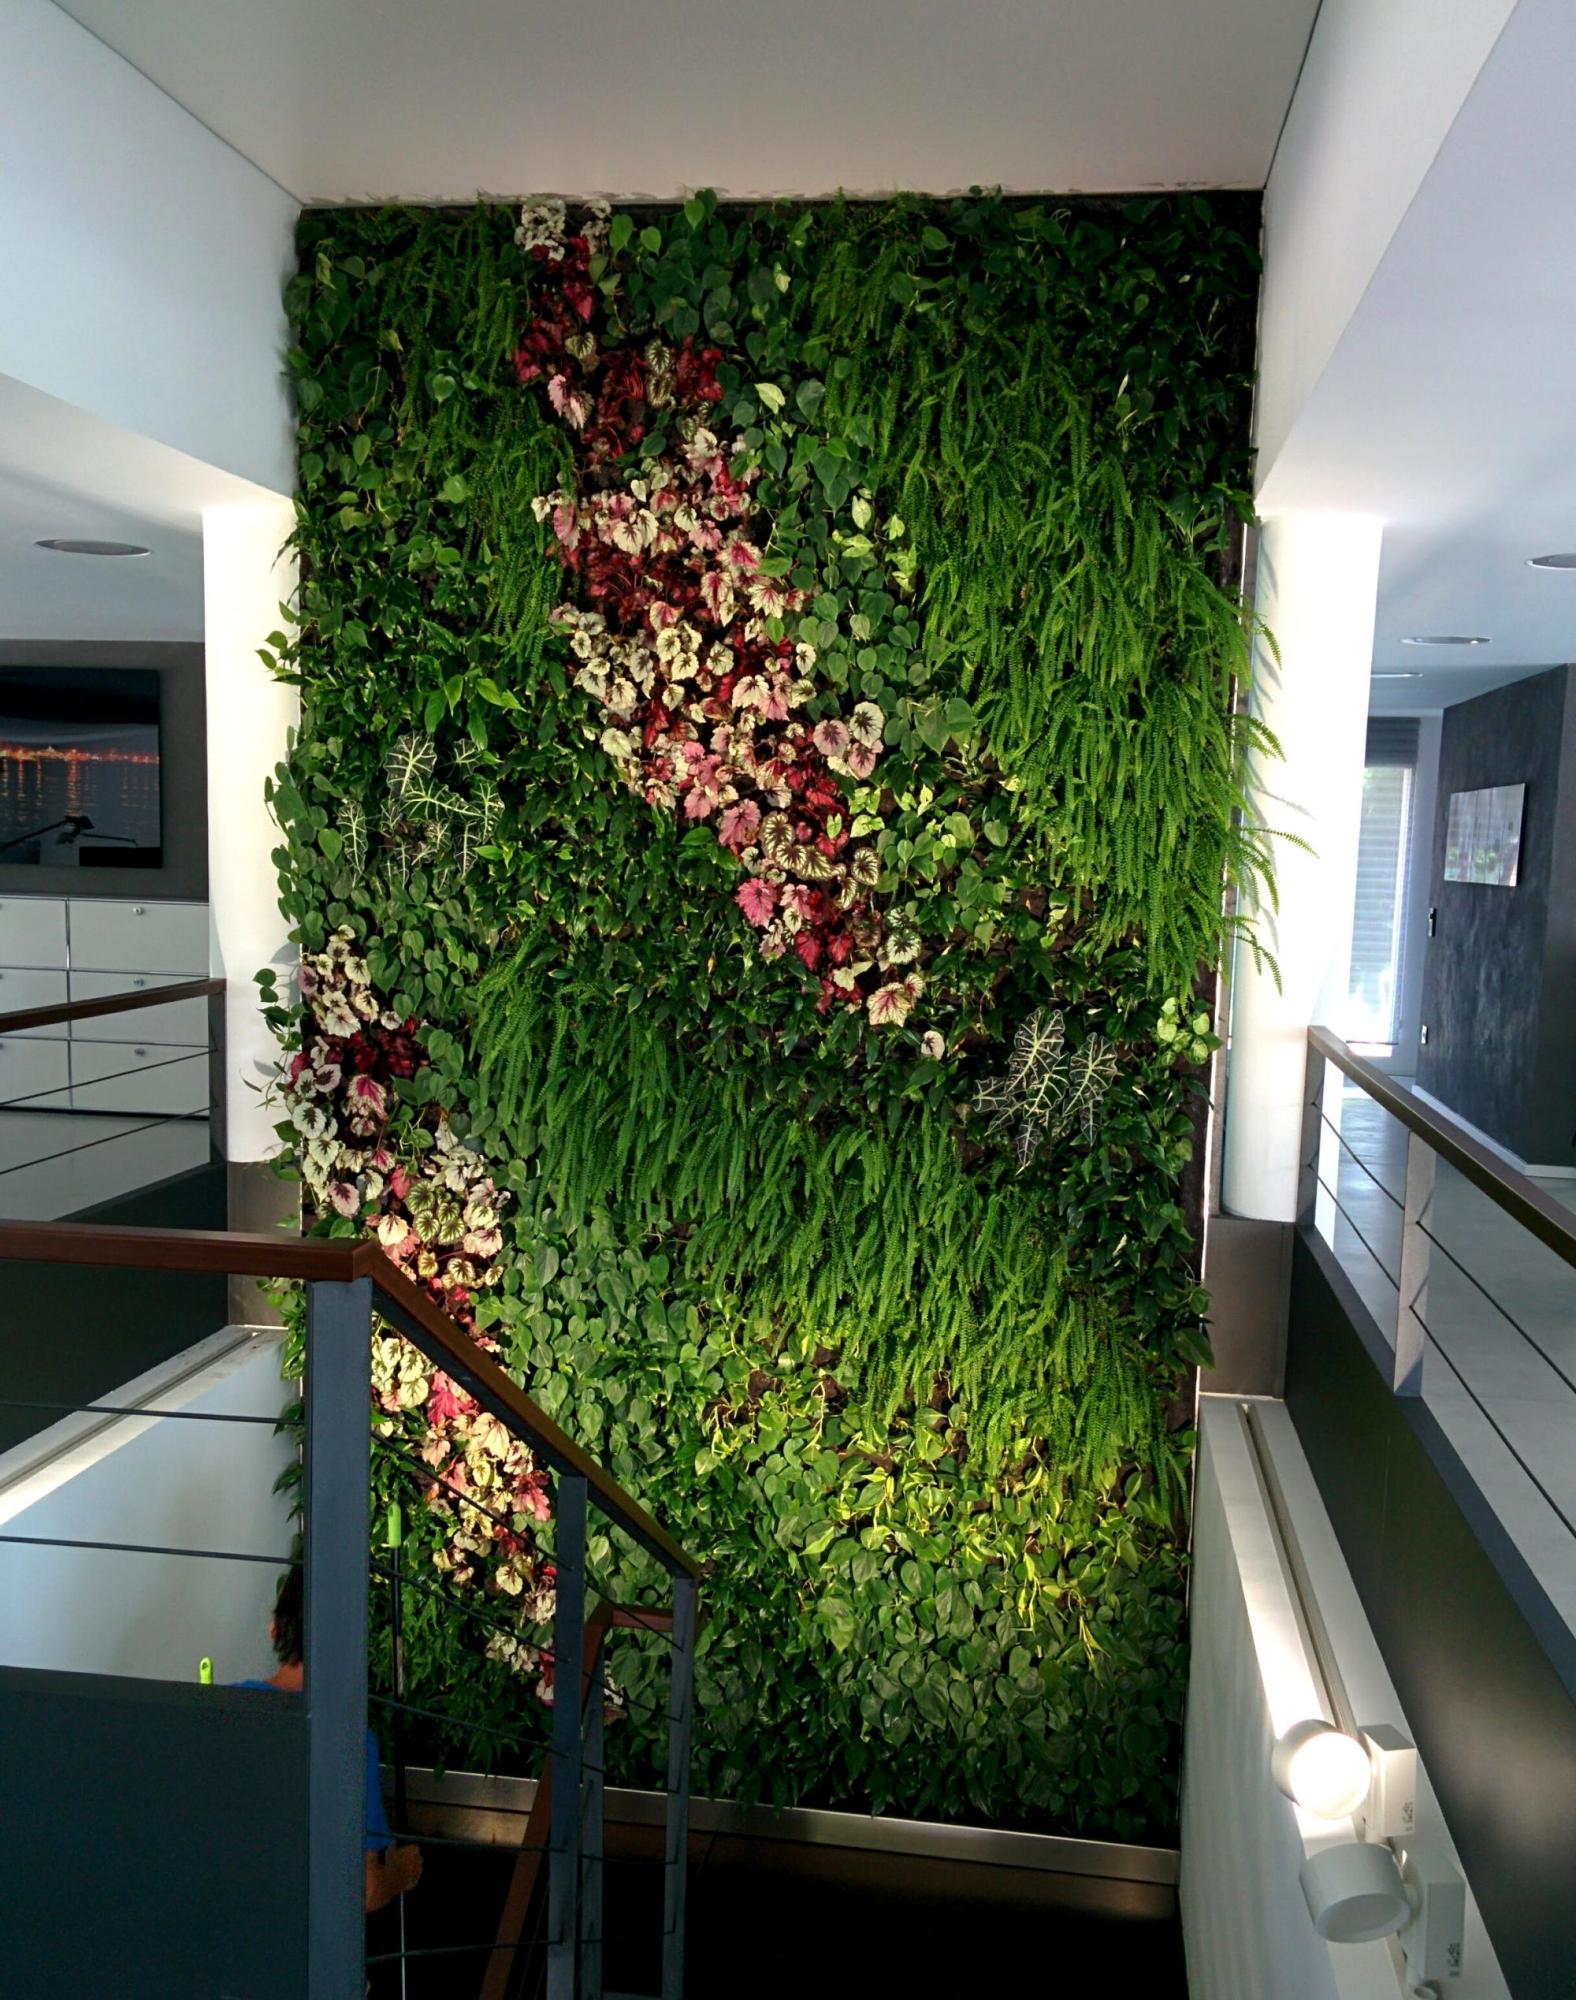 Jard n vertical en mallorca santa pon a alicante forestal for Jardin vertical oficina